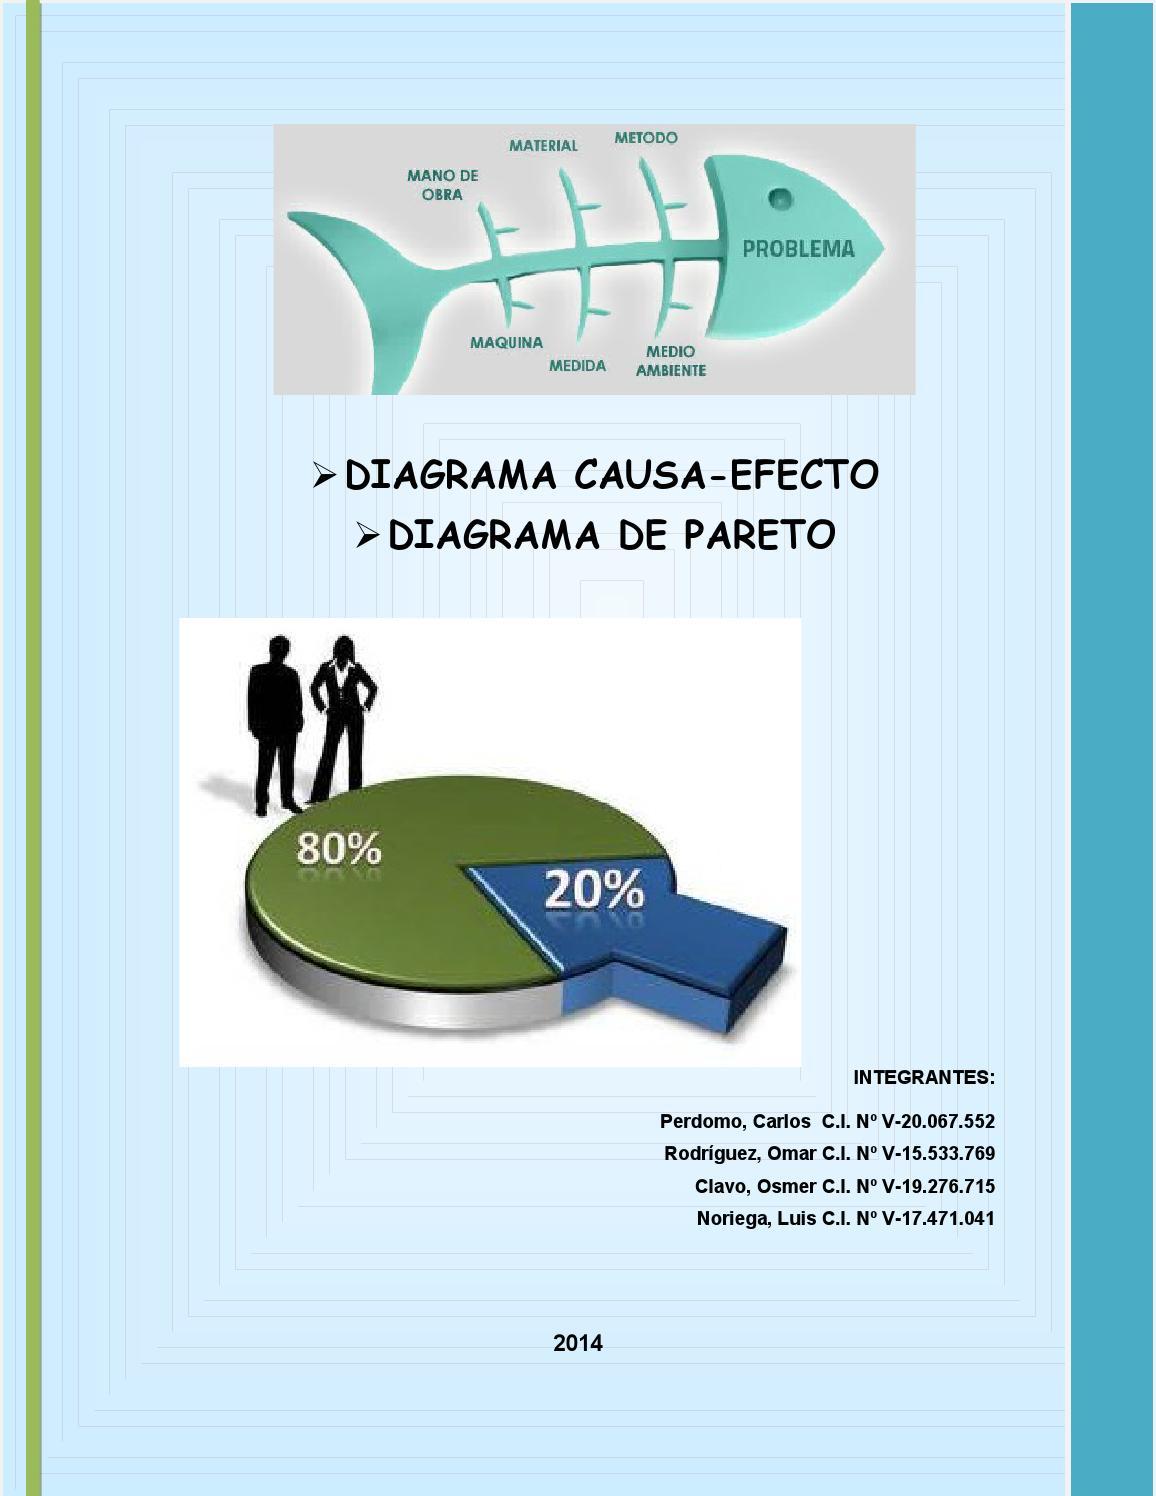 Diagrama causa-efecto by omar rodriguez - issuu